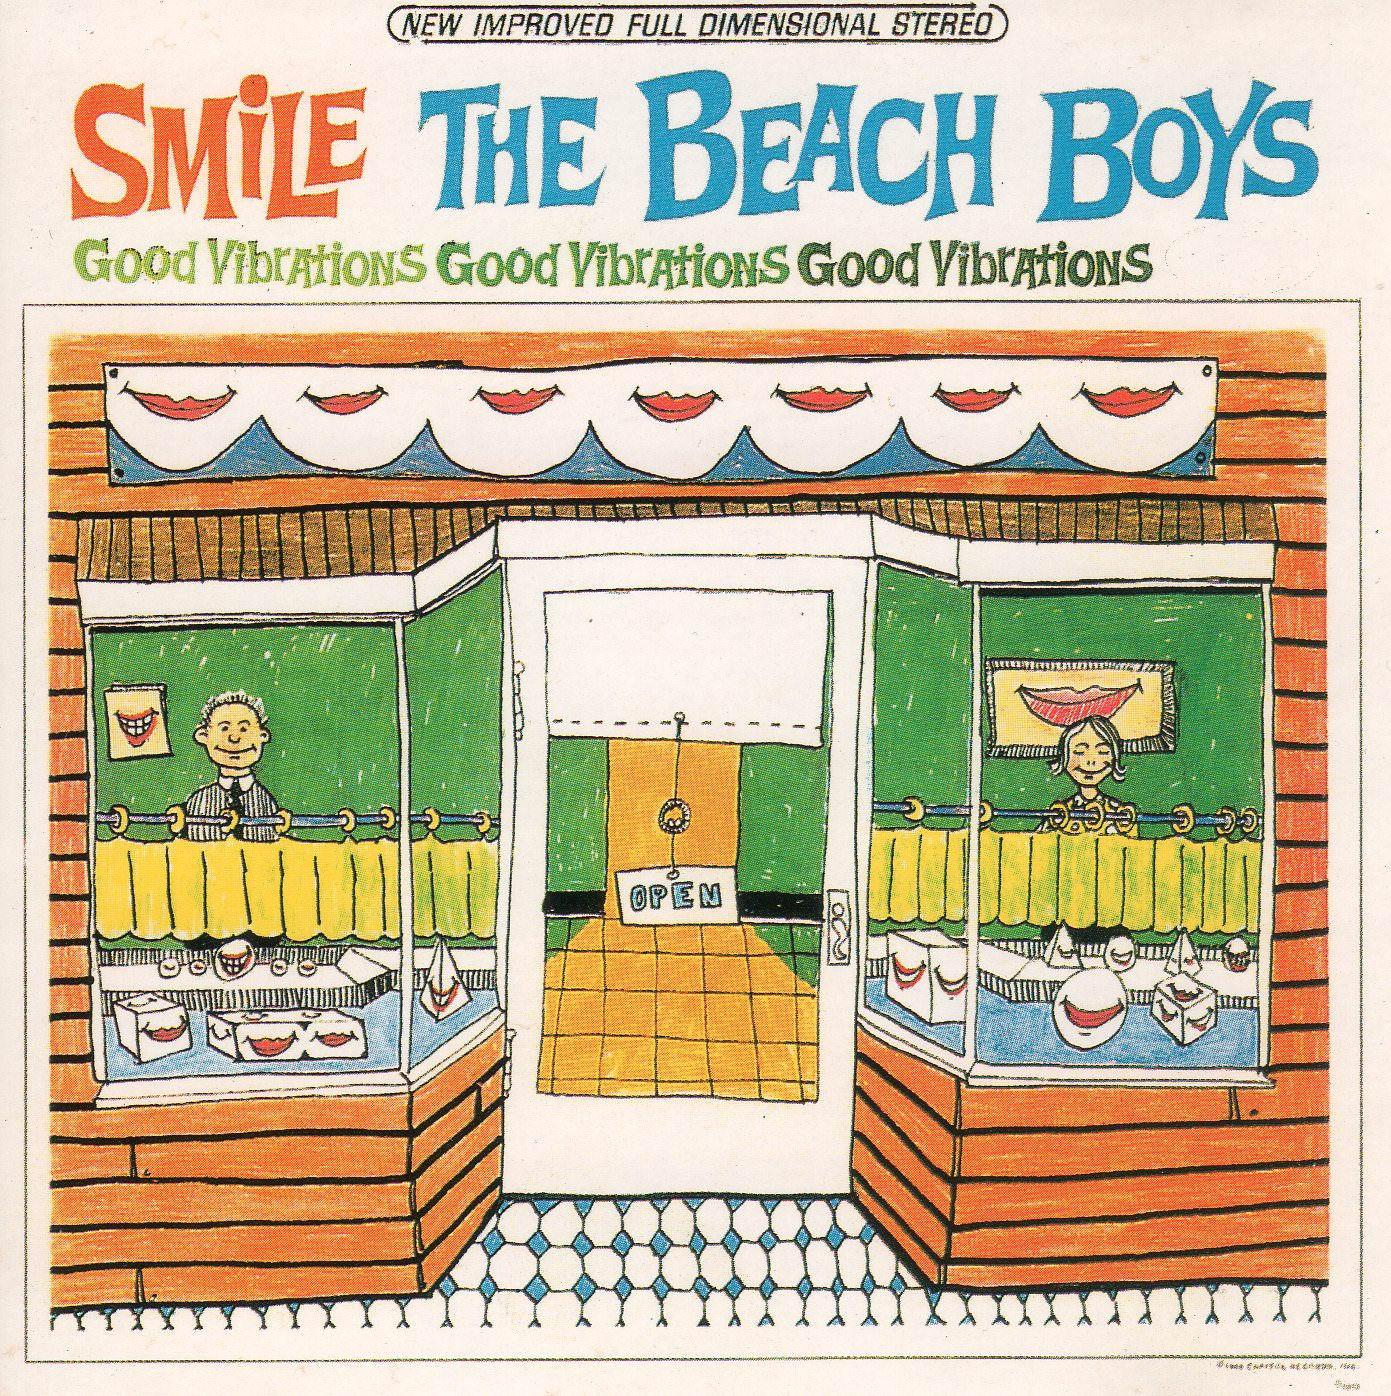 Beach Boys SMiLE cover